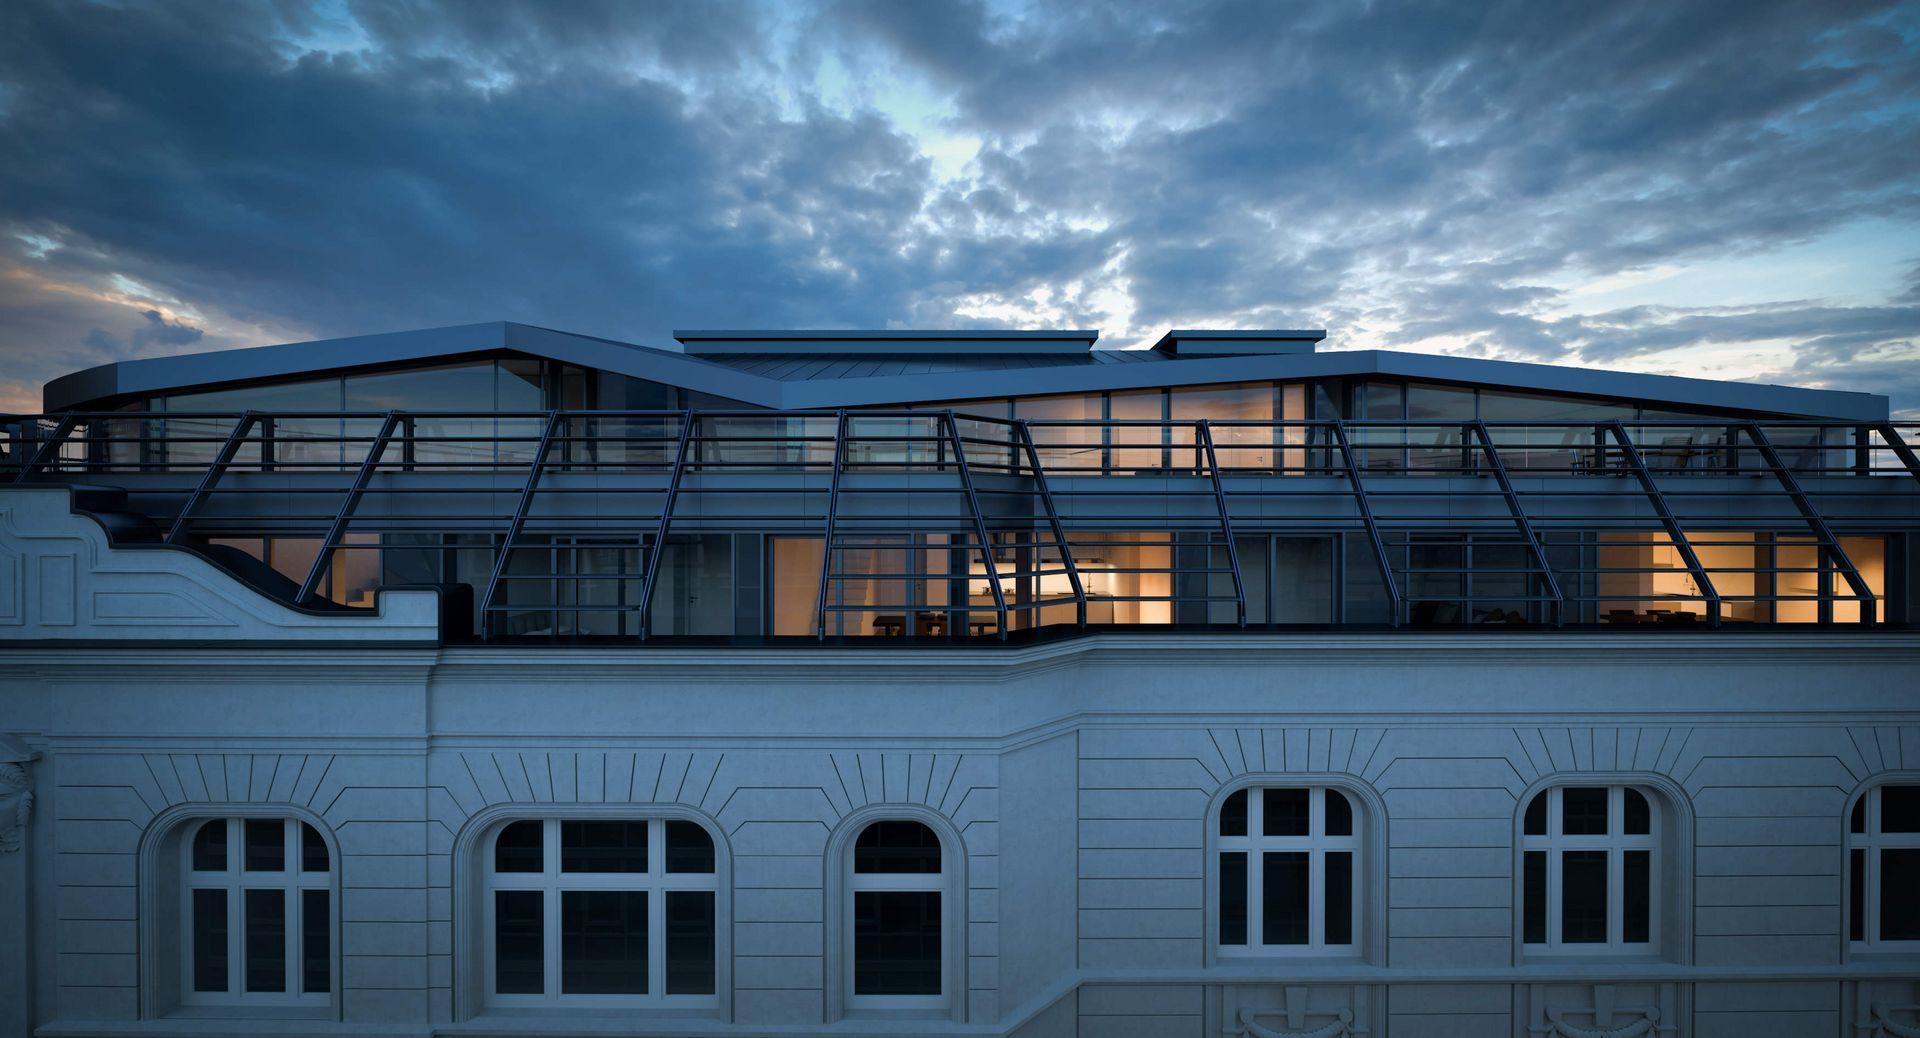 3d Visualisierung Hamburg architekturvisualisierung und 3d visualisierung gmsvision